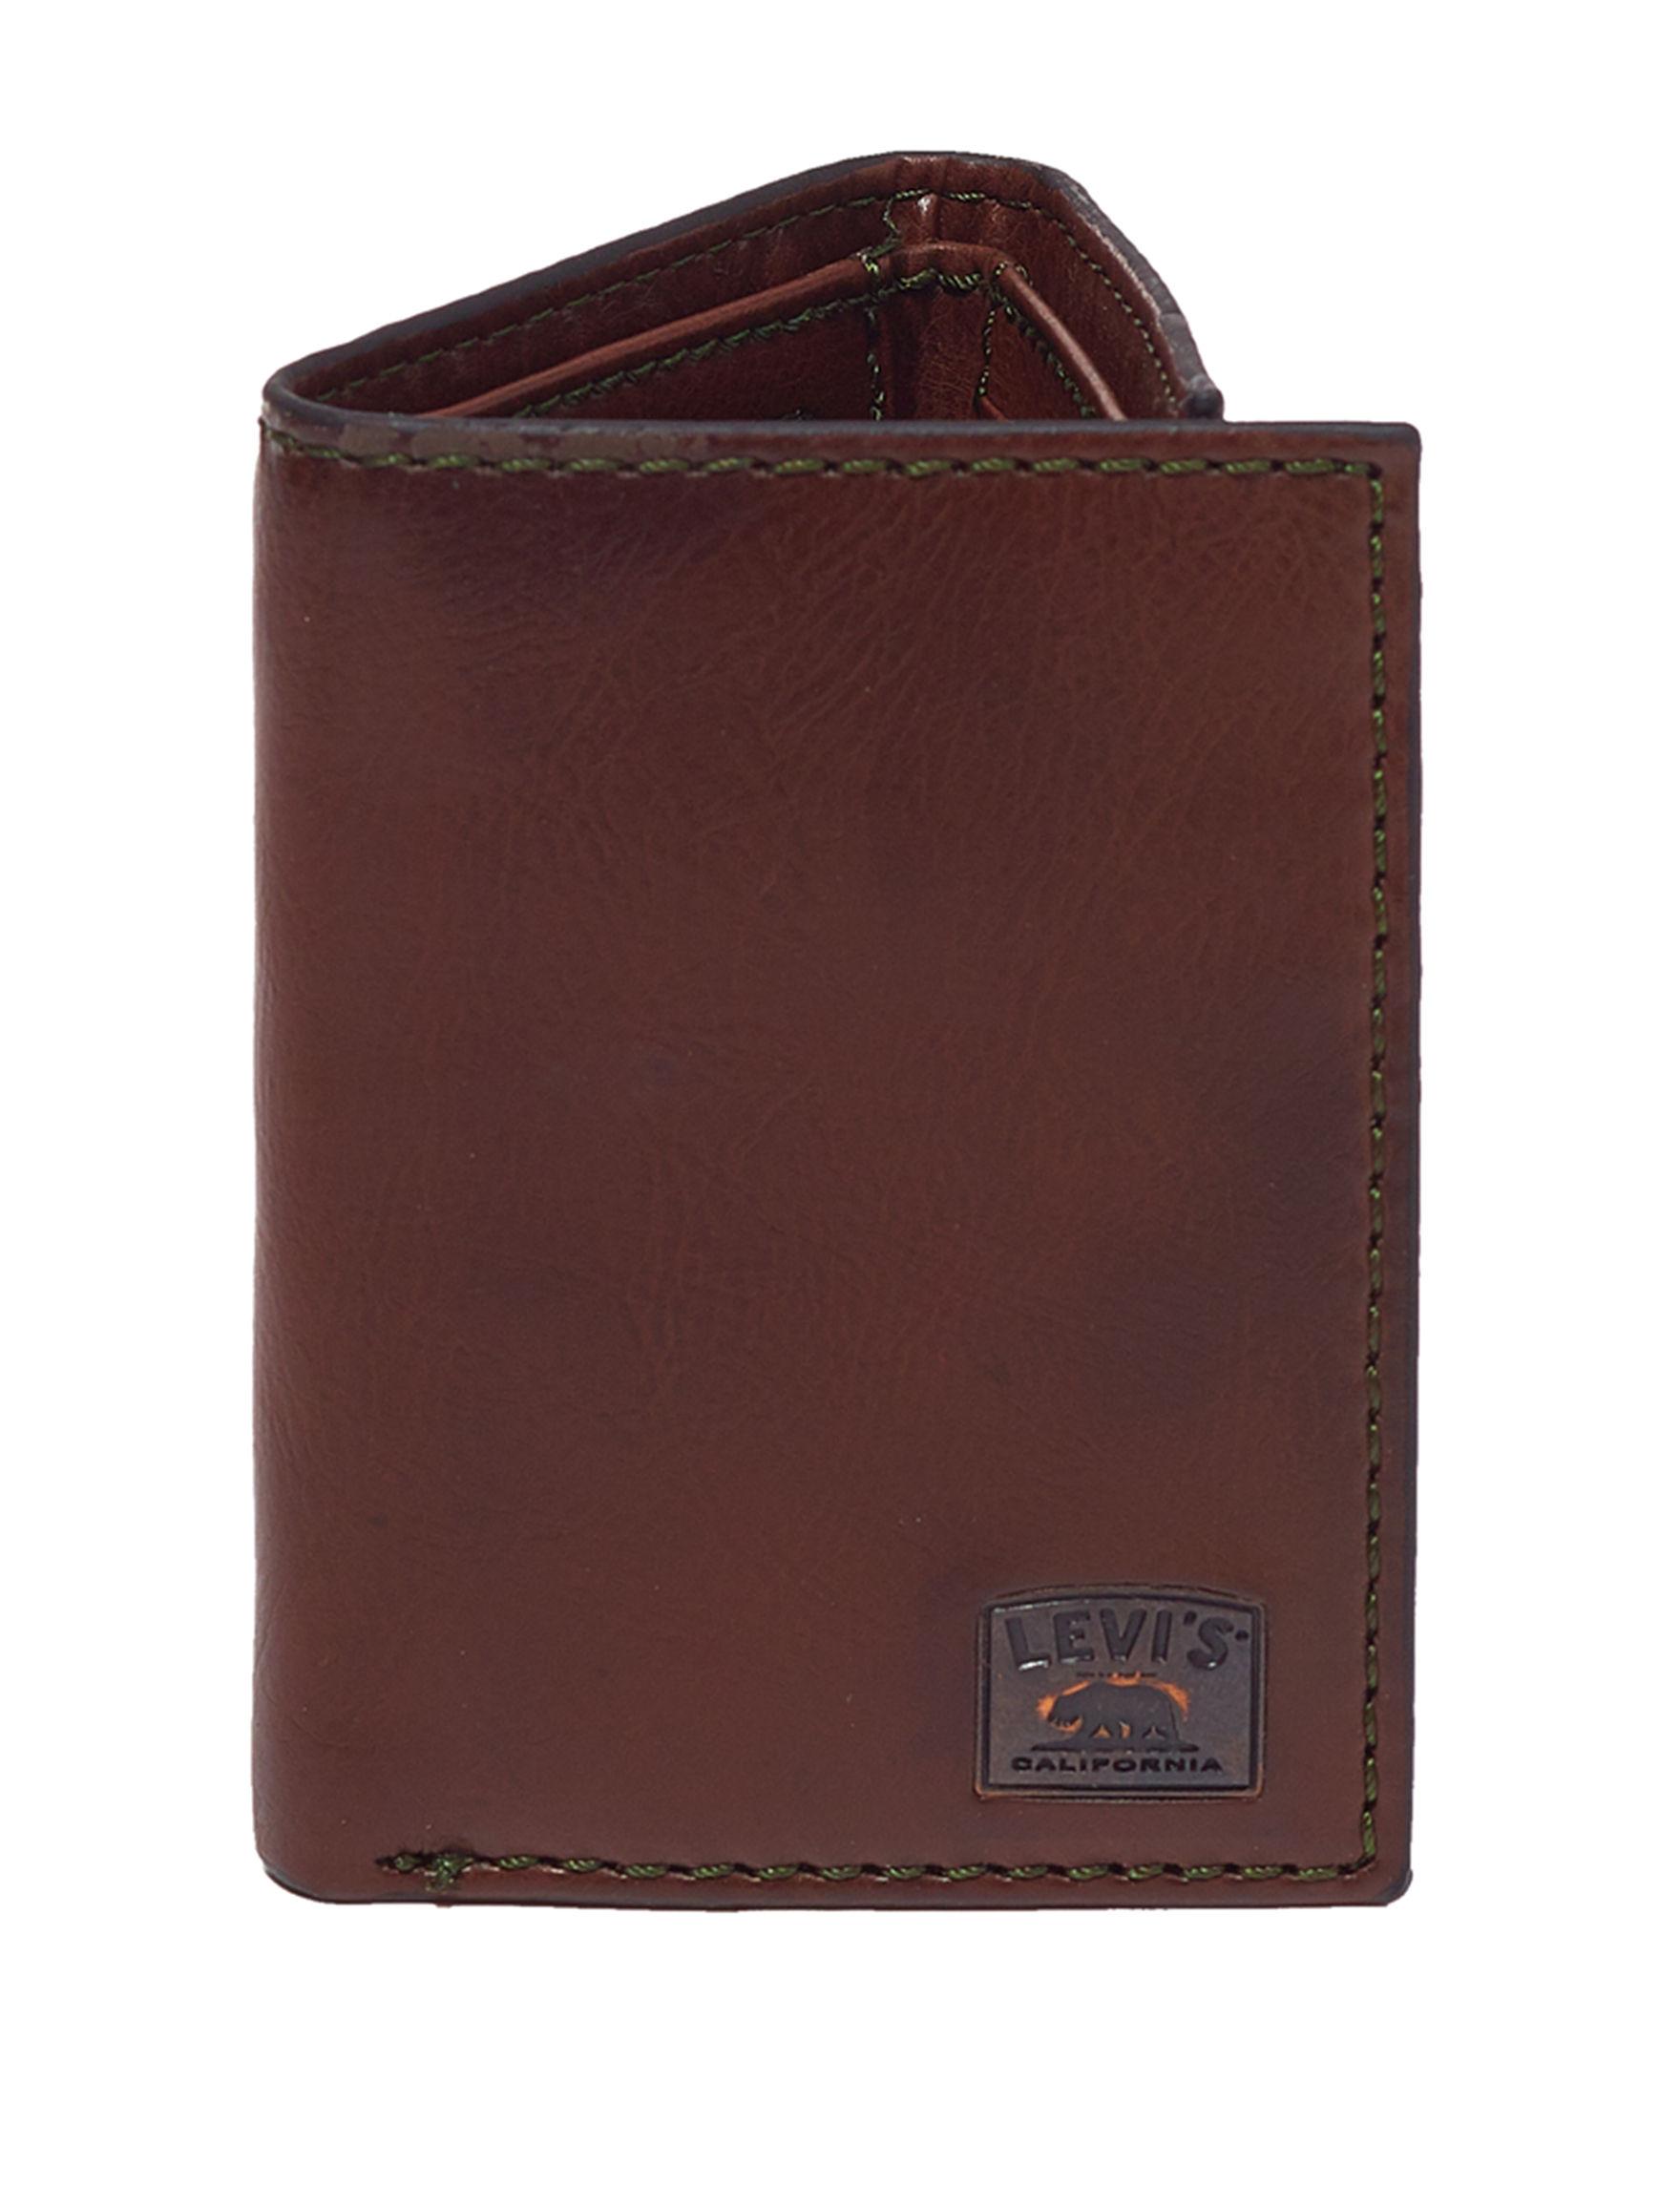 Levi's Brown Tri-fold Wallets